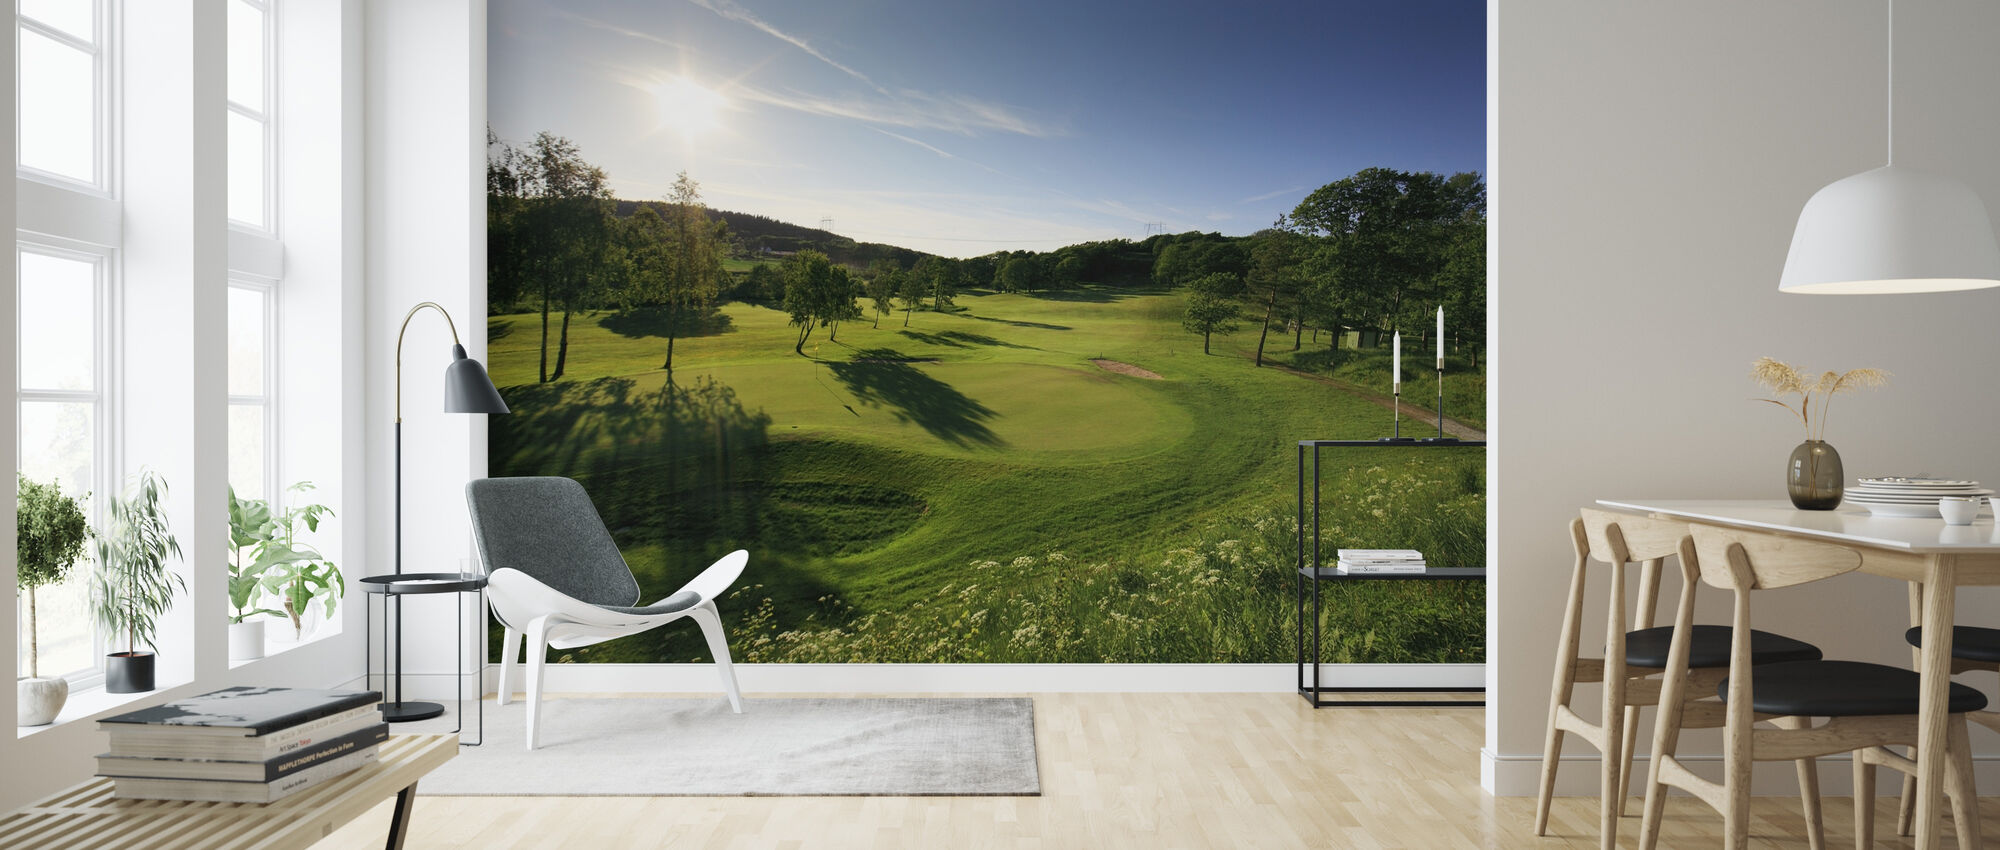 Golfbaan in Göteborg, Zweden - Behang - Woonkamer